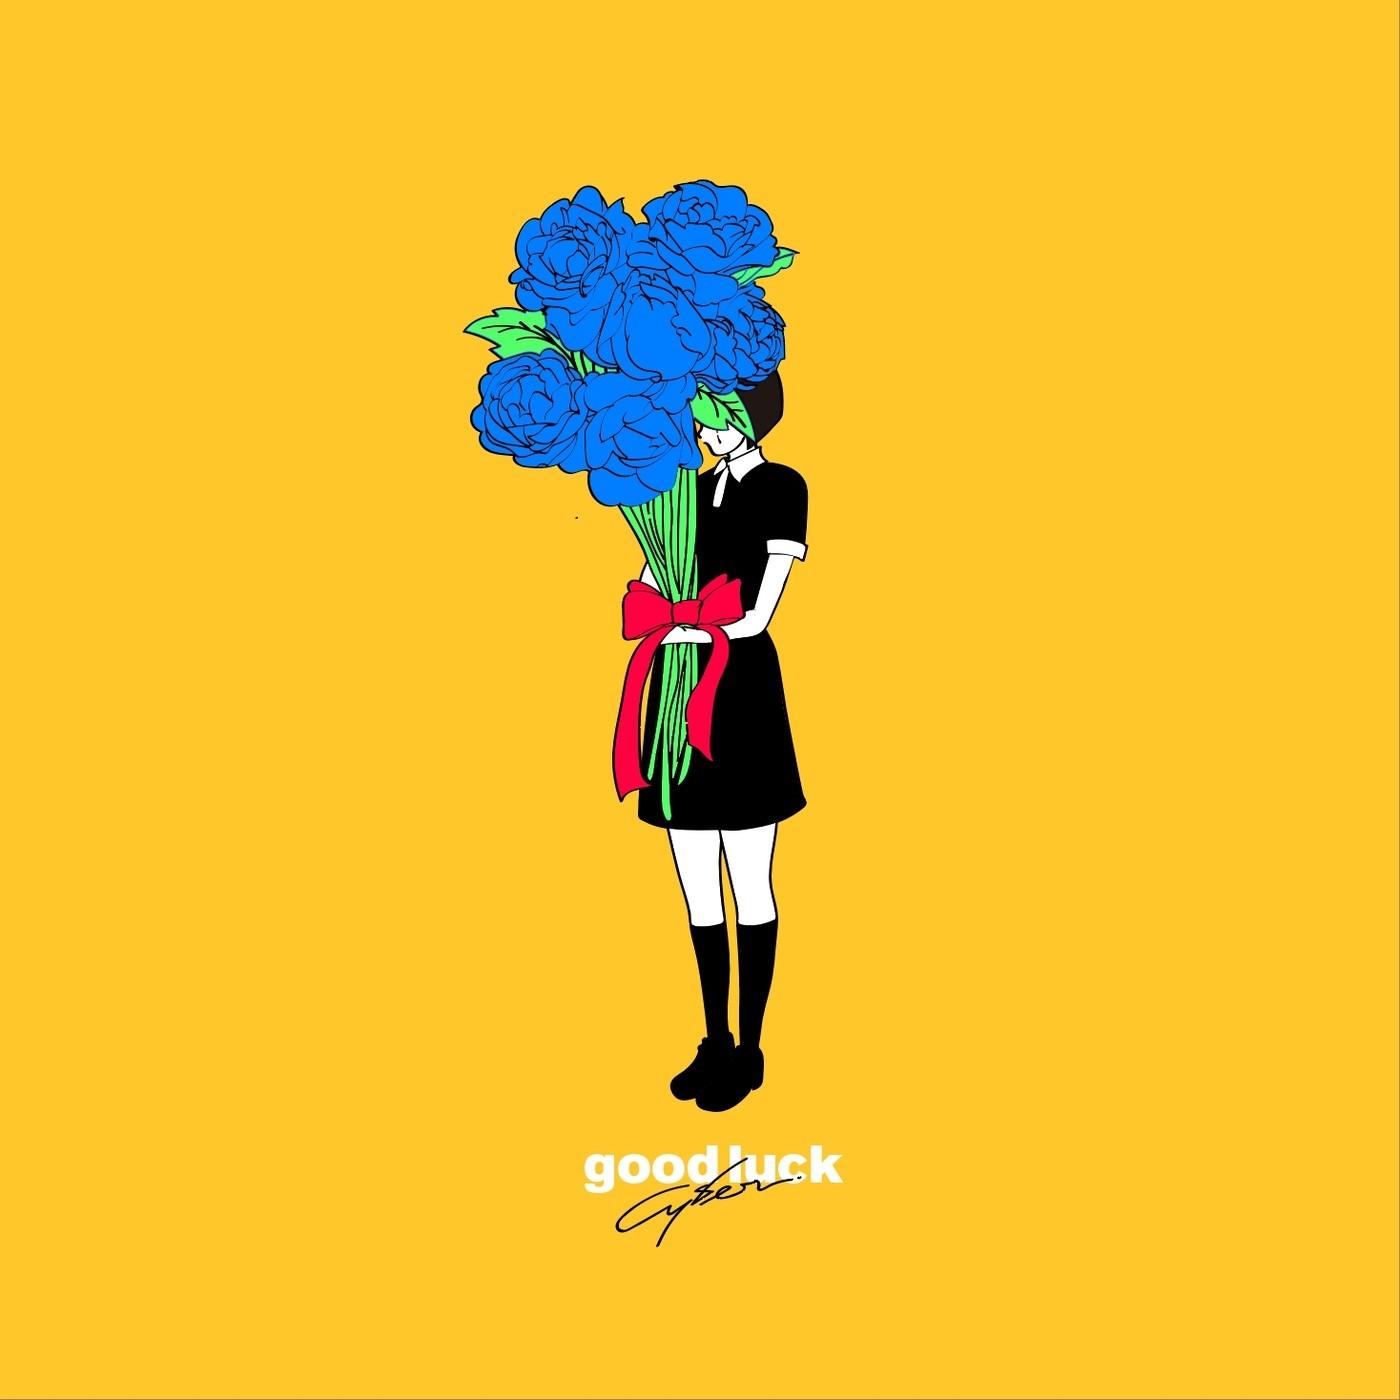 CY8ER – GOOD LUCK [FLAC + MP3 320 / WEB] [2018.10.26]